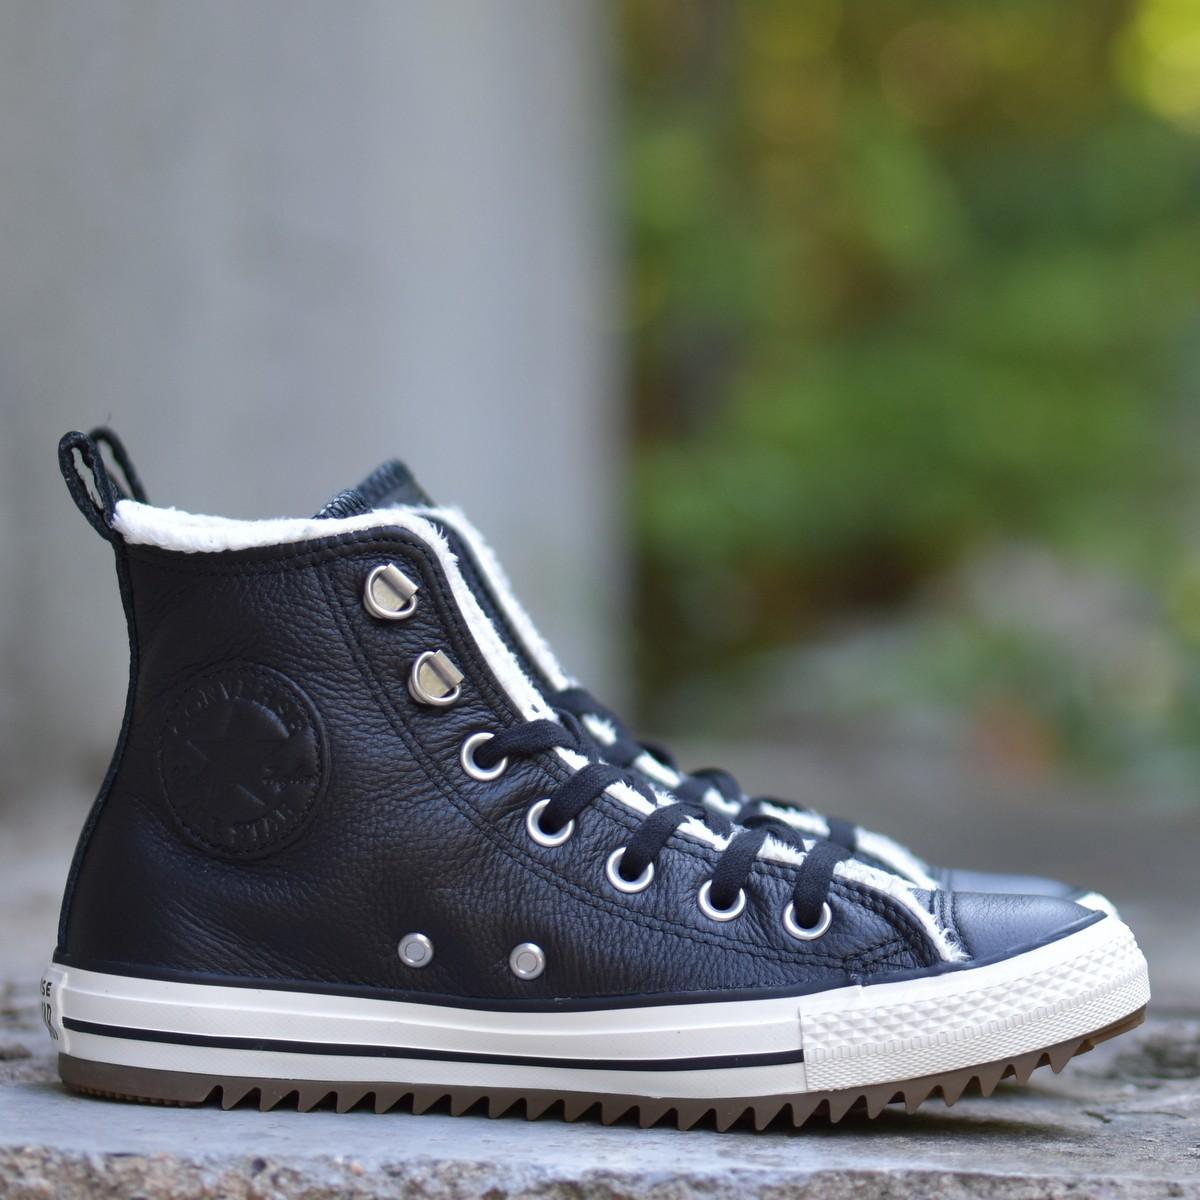 cdb554aefa6a converse Chuck Taylor All Star Hiker Boot Dámské boty EU 36.5 C161512